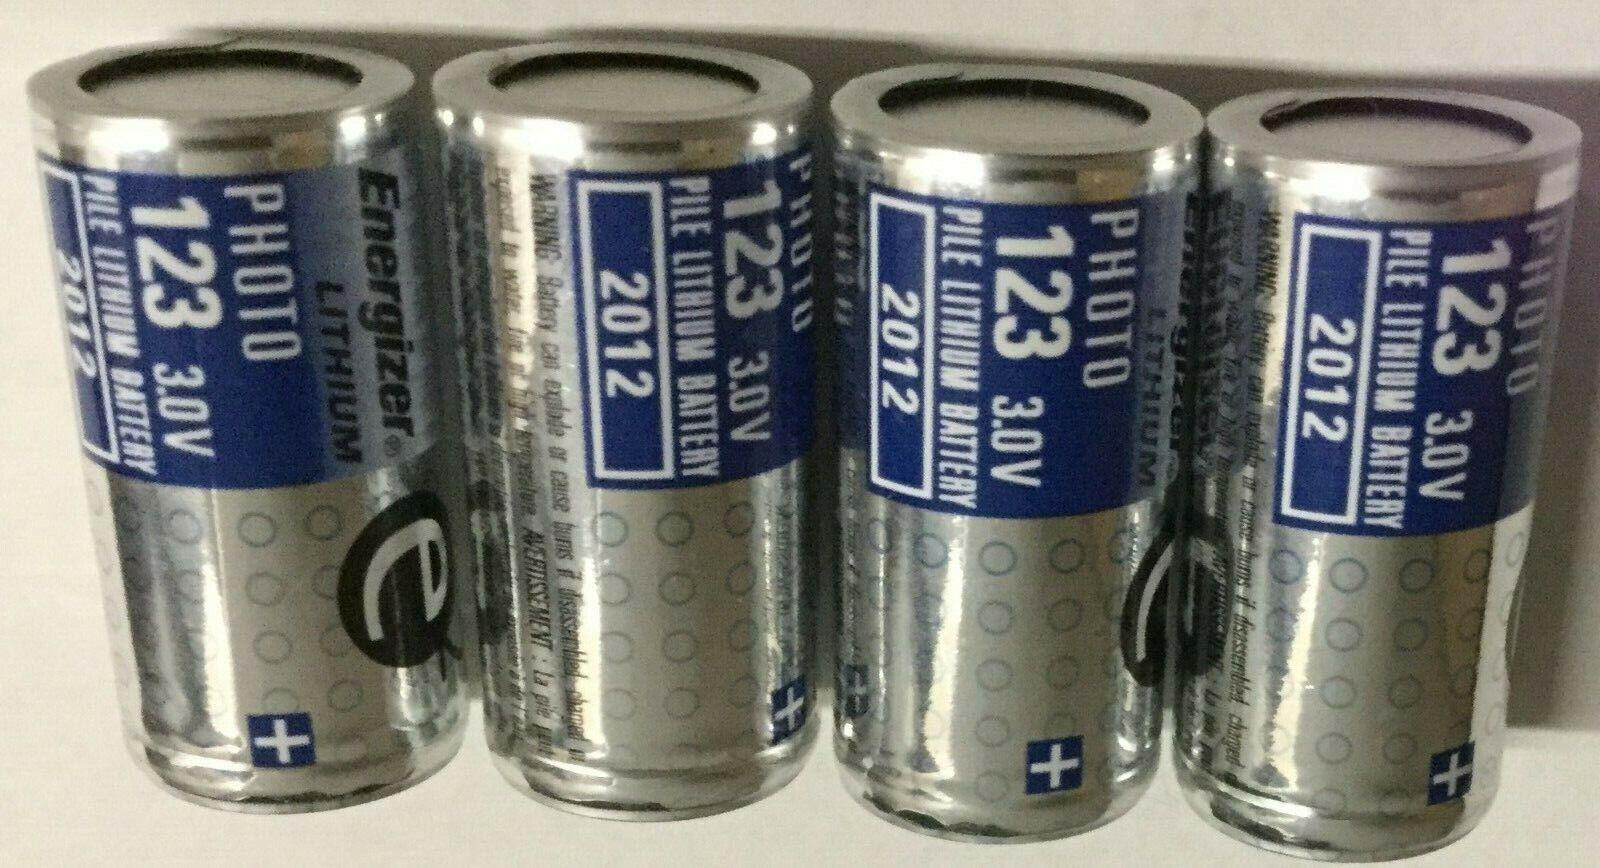 Energizer EL123A CR123A 3 Volt Photo Lithium Battery 4 Pack